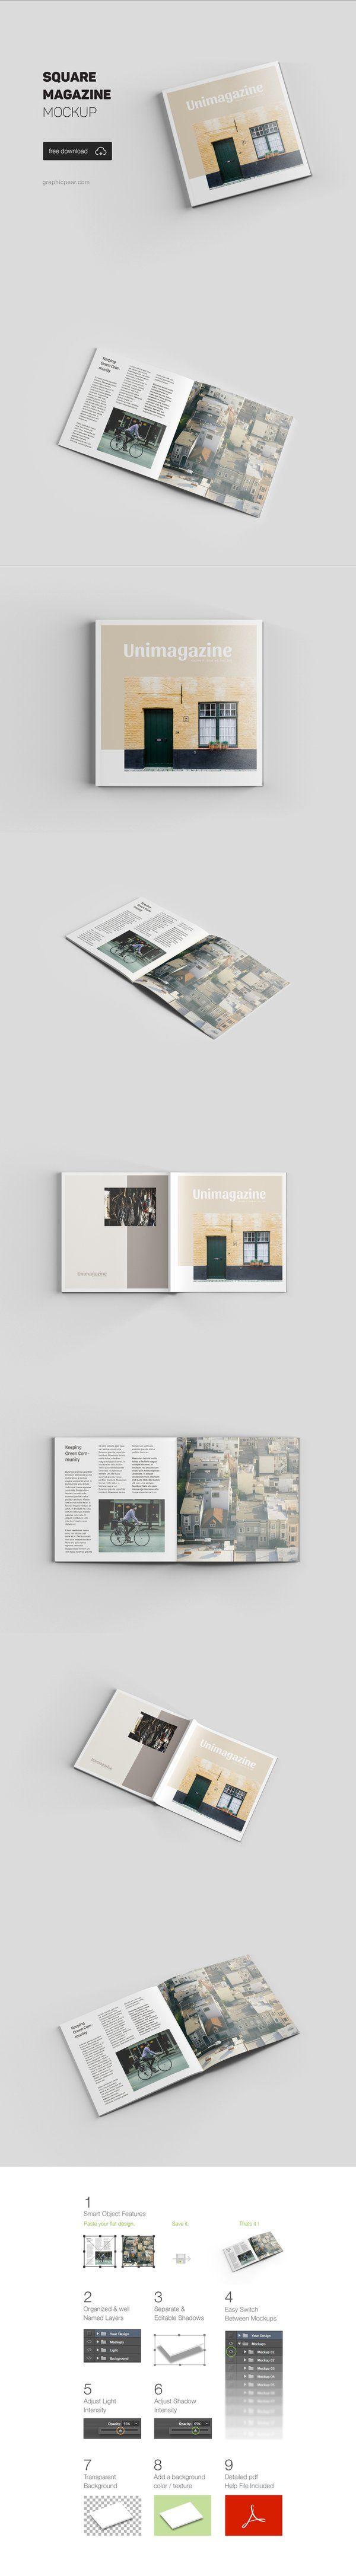 download interior design magazine pdf downloads